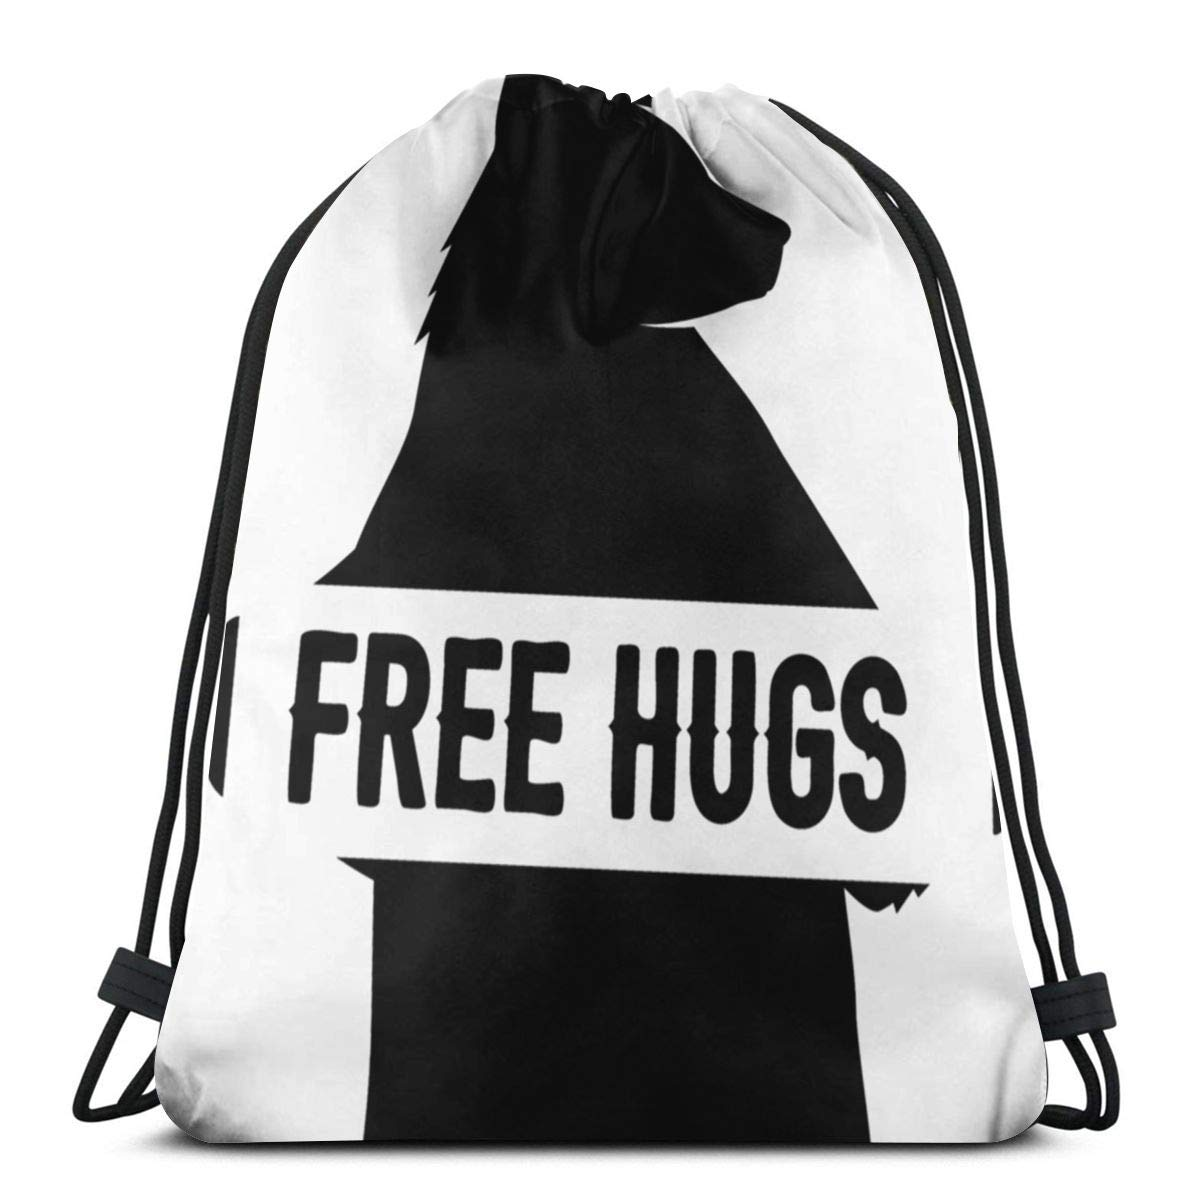 Wangchangjin Drawstring Bags Free Hugs Sport Gym Tennis Casual Daypack Backpacks Swimming Hiking Yoga Portable Travel for Women and Men